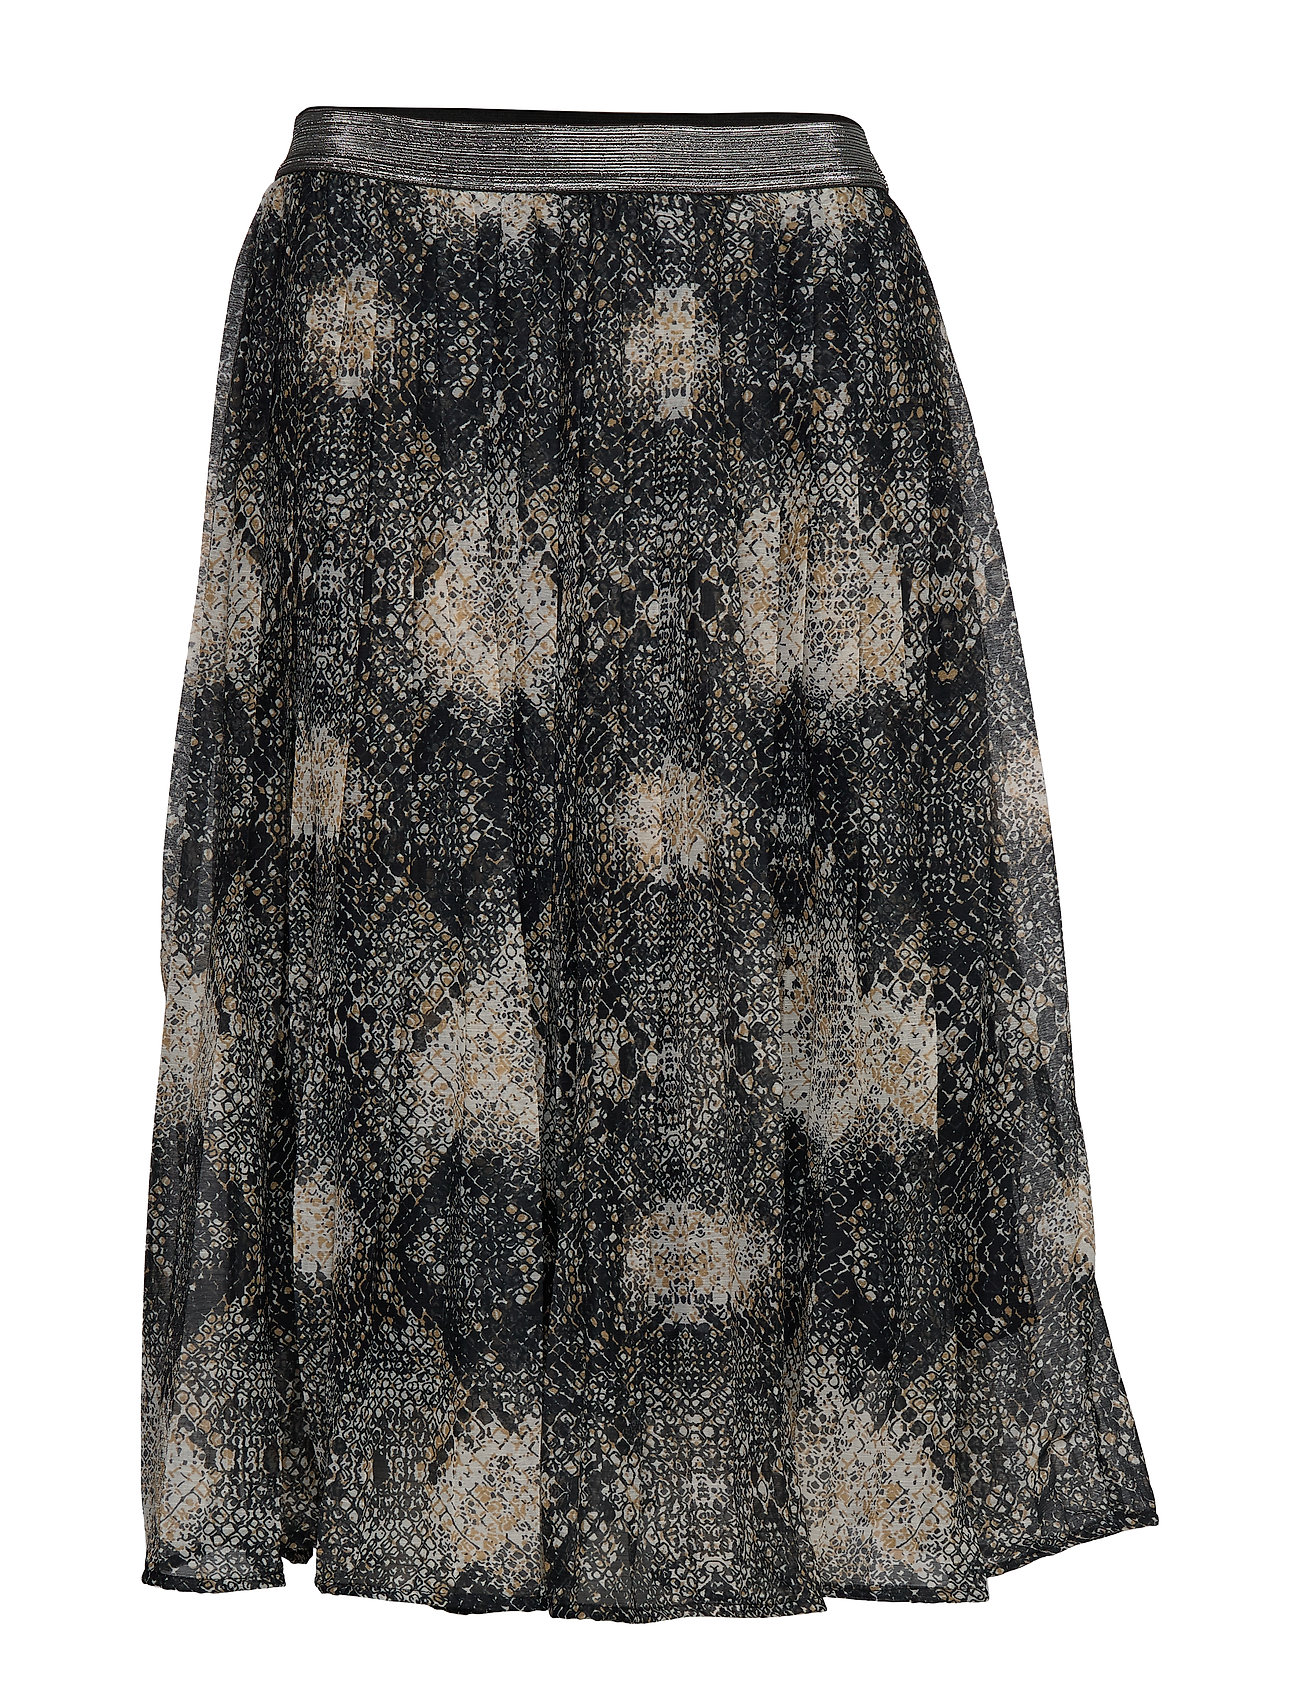 Cream Shaky skirt - PITCH BLACK